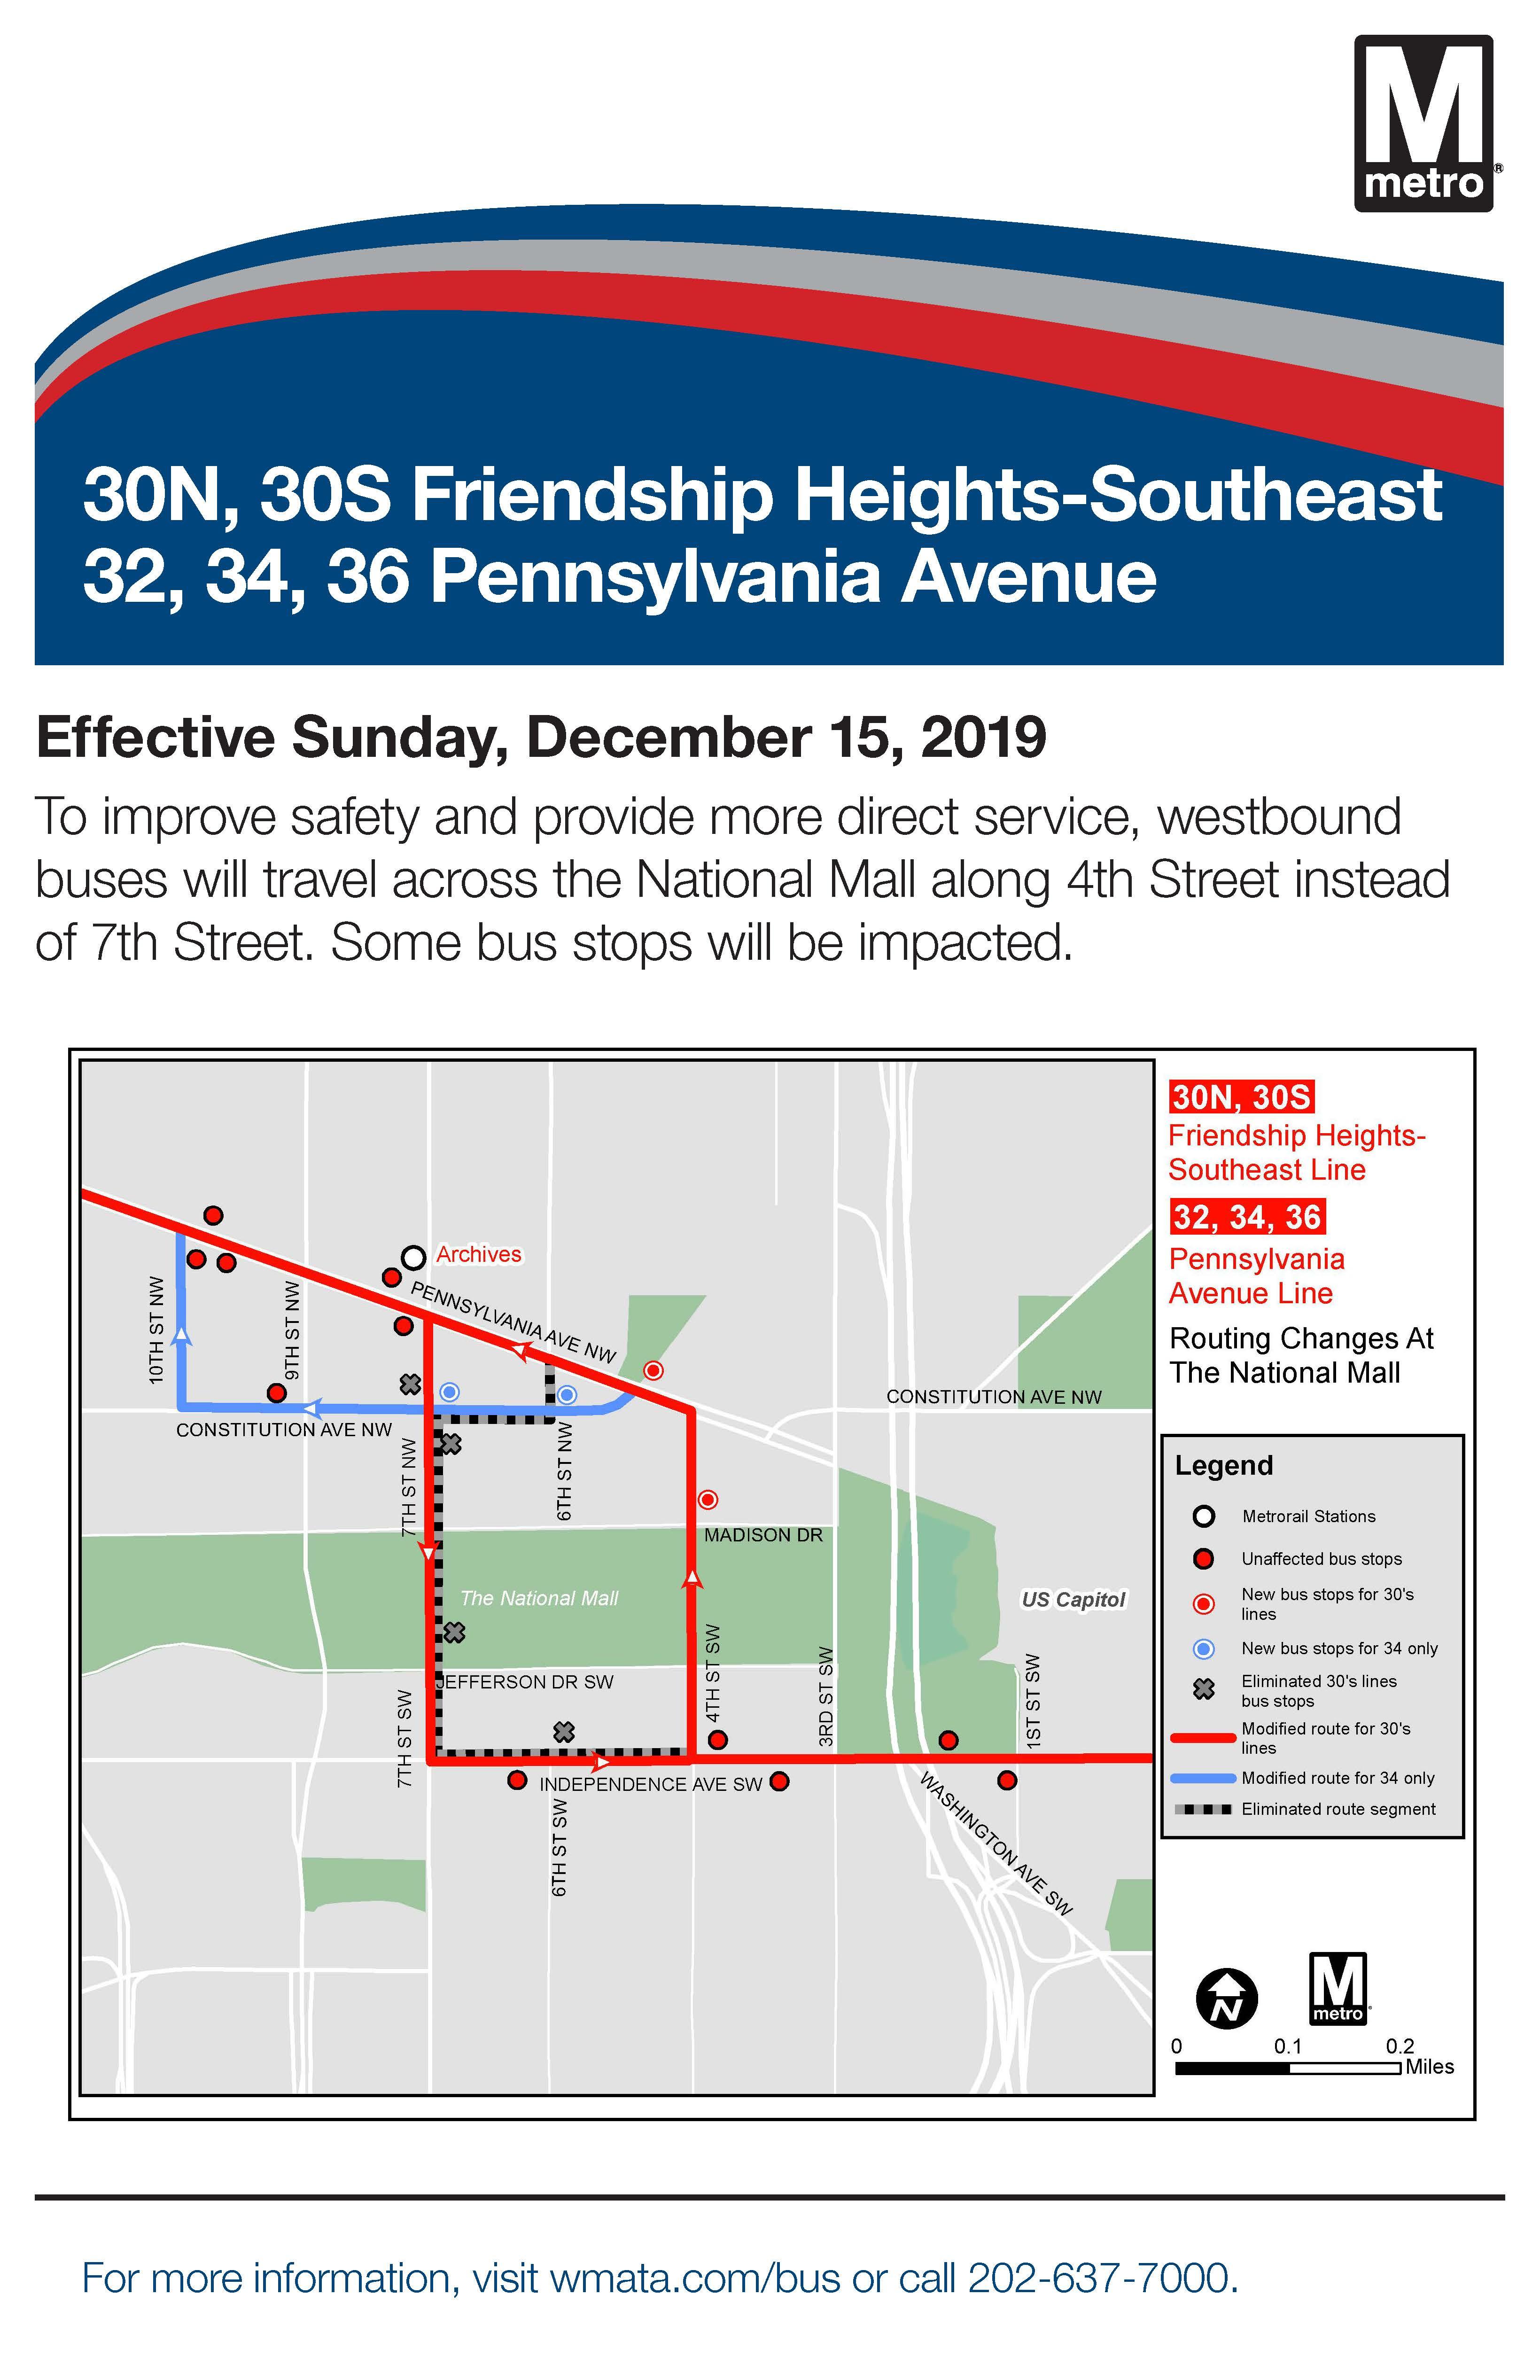 Metrobus Service Changes Beginning Sunday December 15